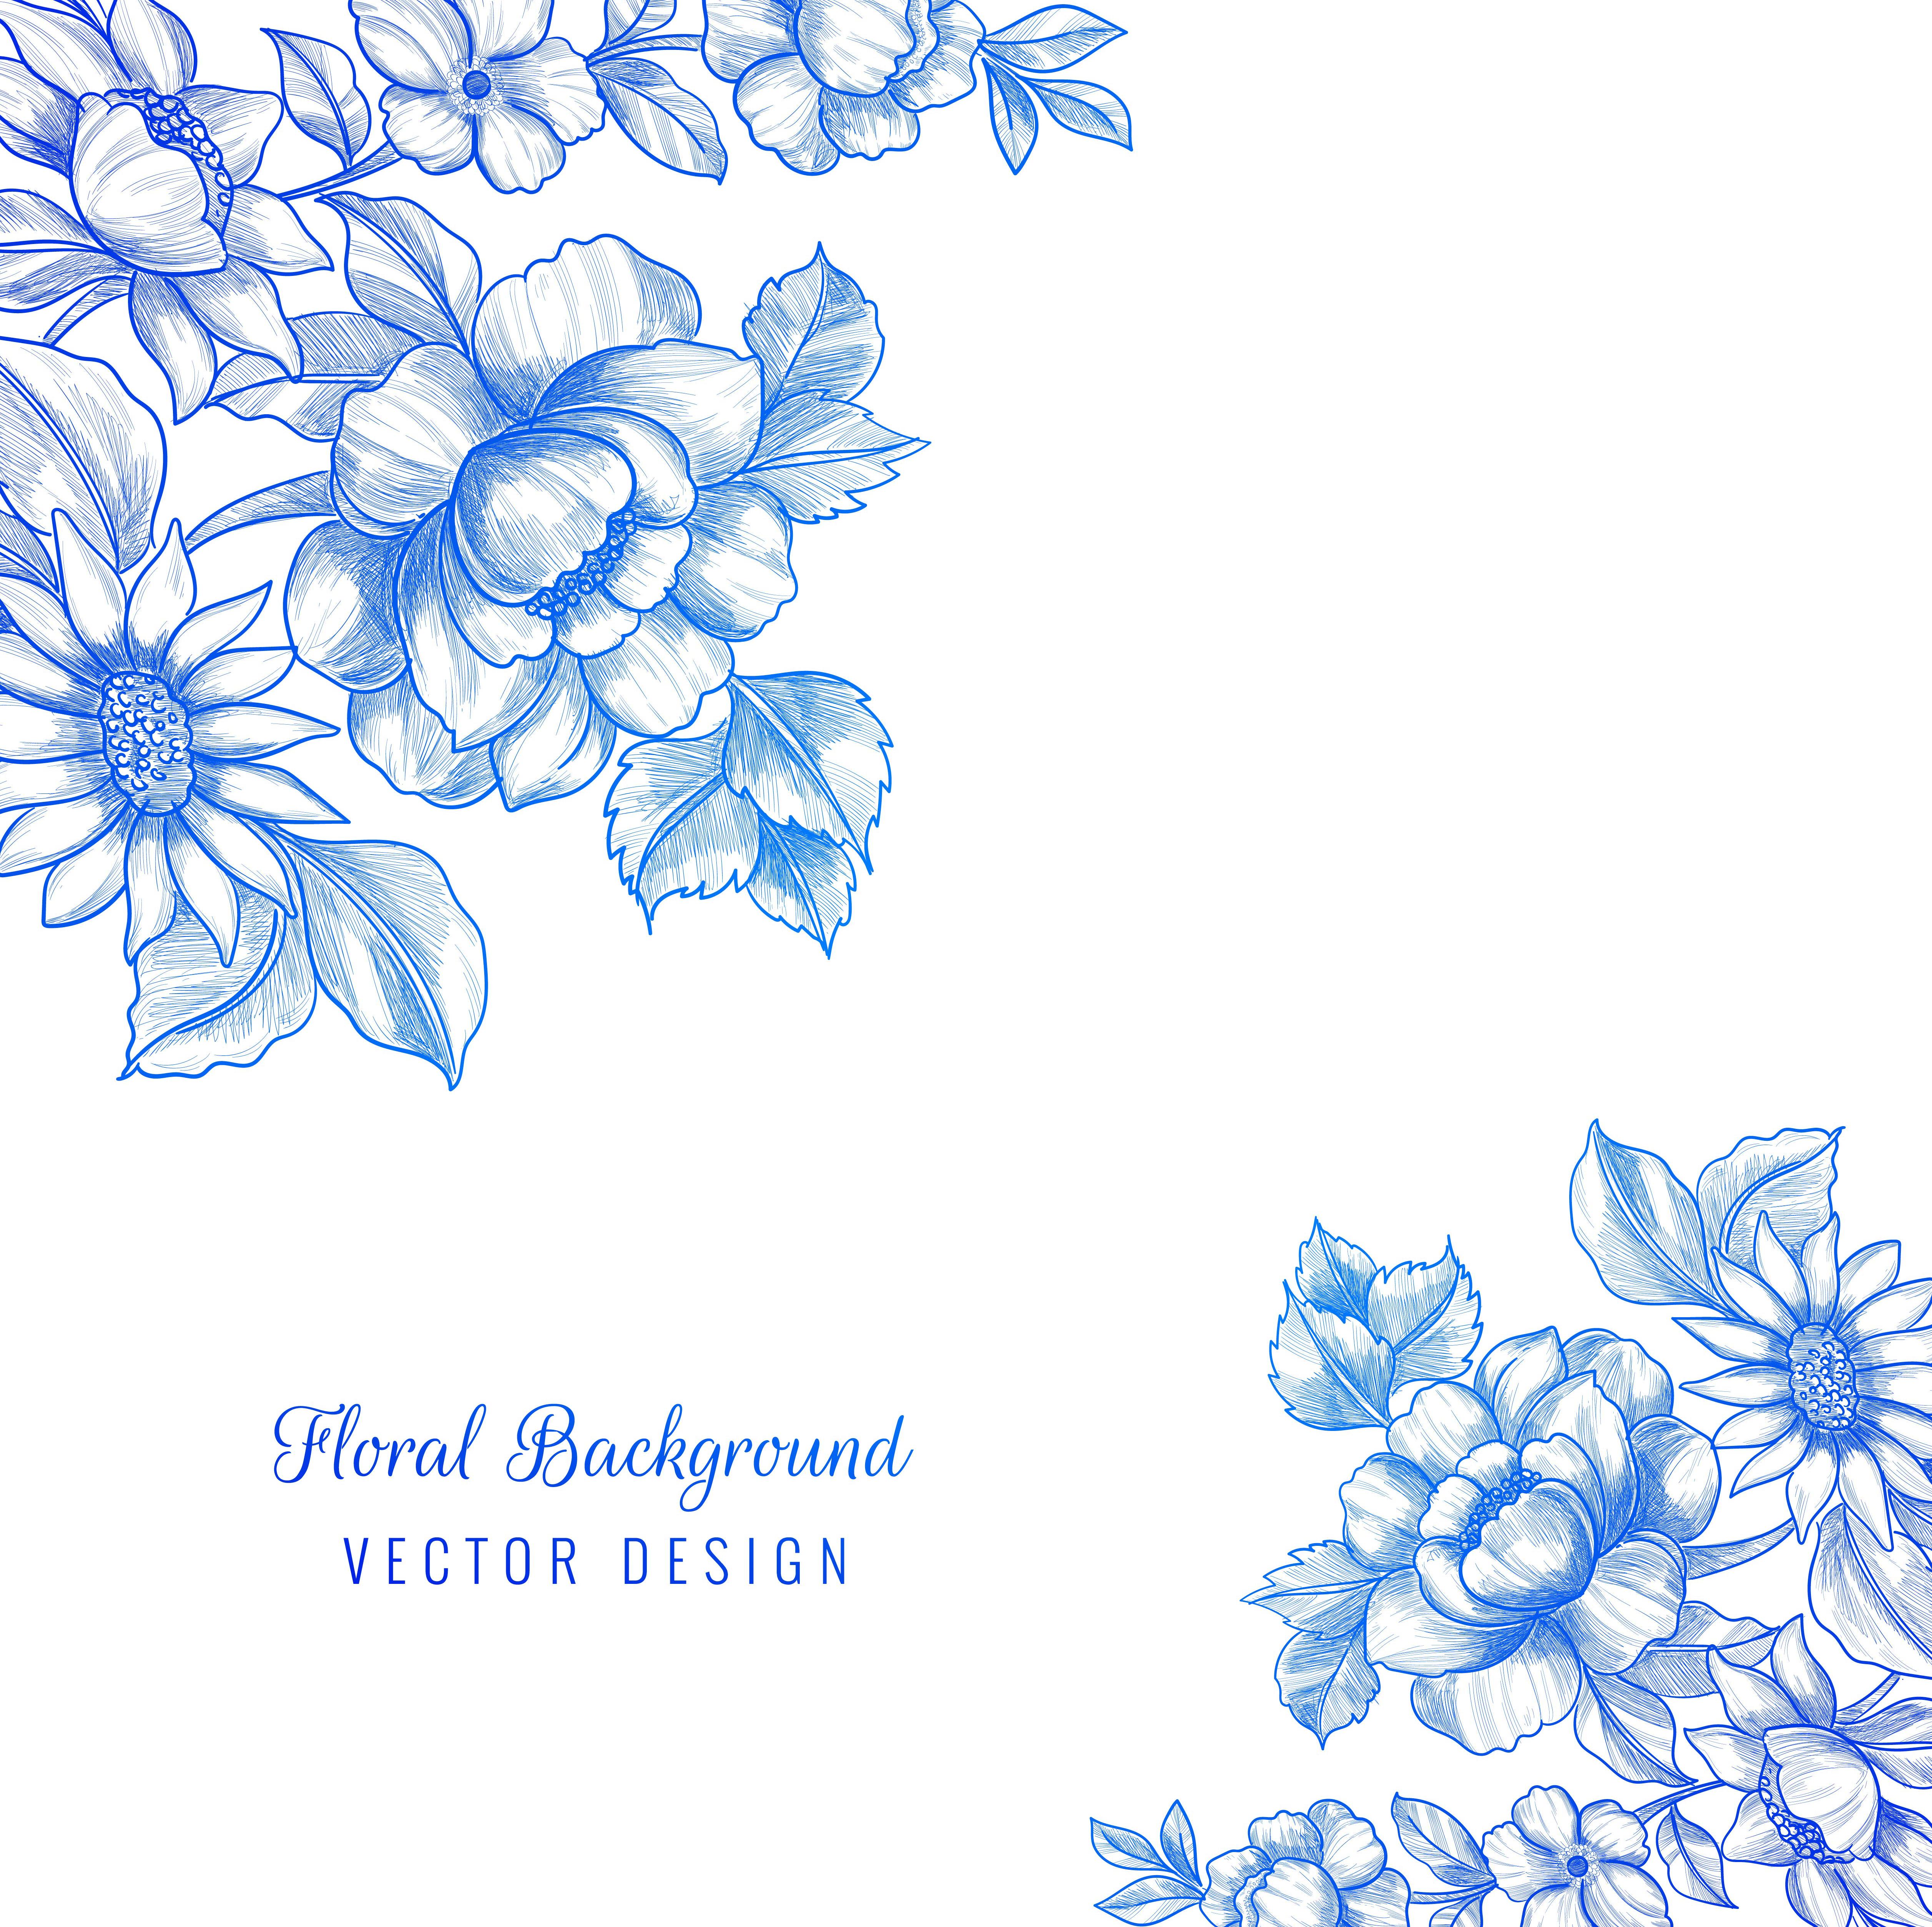 beautiful decorative blue floral corner design download free vectors clipart graphics vector art vecteezy